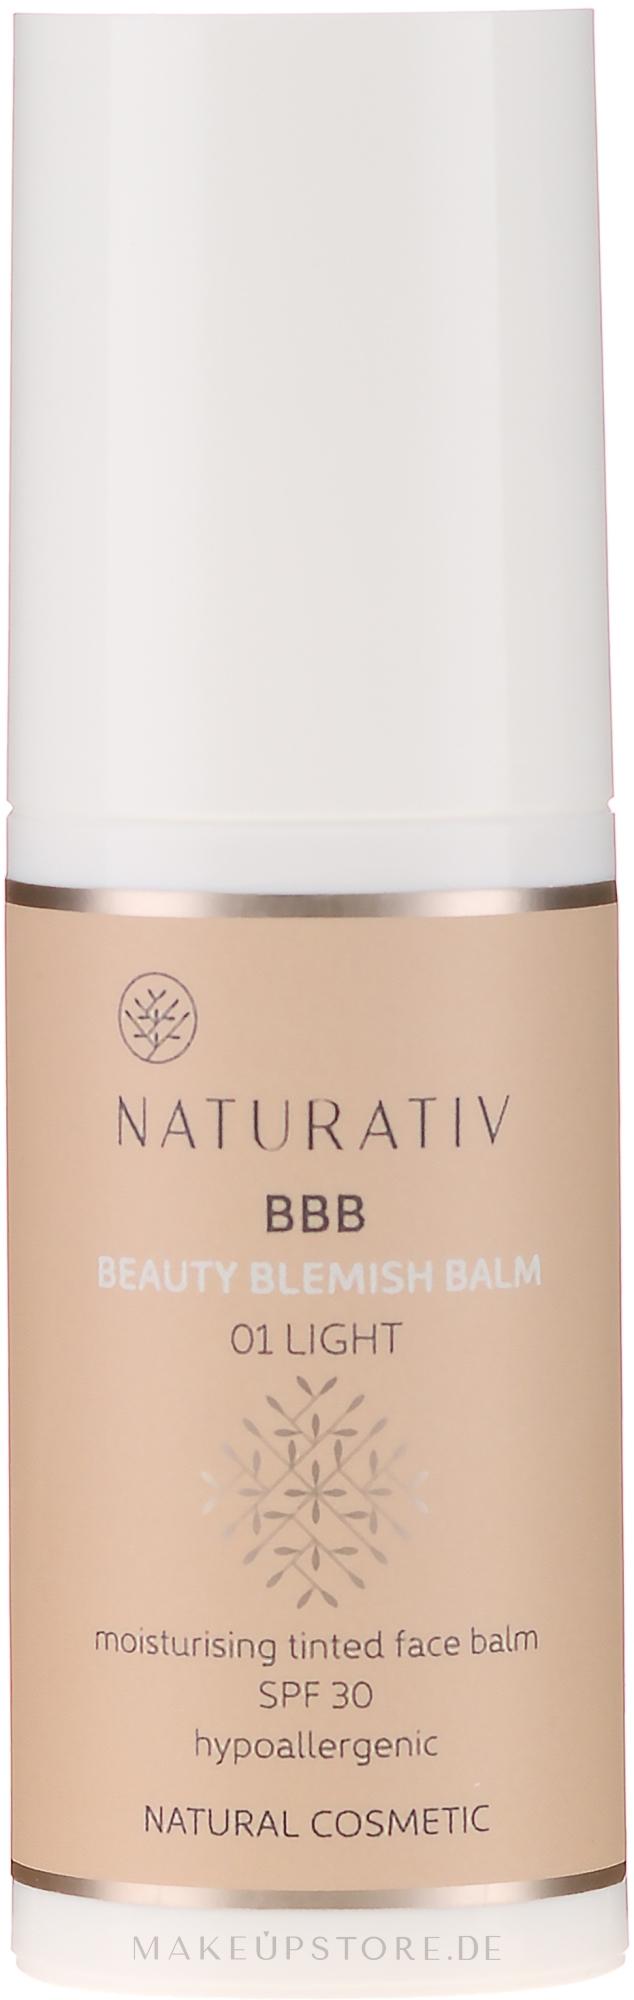 Feuchtigkeitsspendender BB Balsam LSF 30 - Naturativ Beauty Blemish Balm — Bild 01 - Light